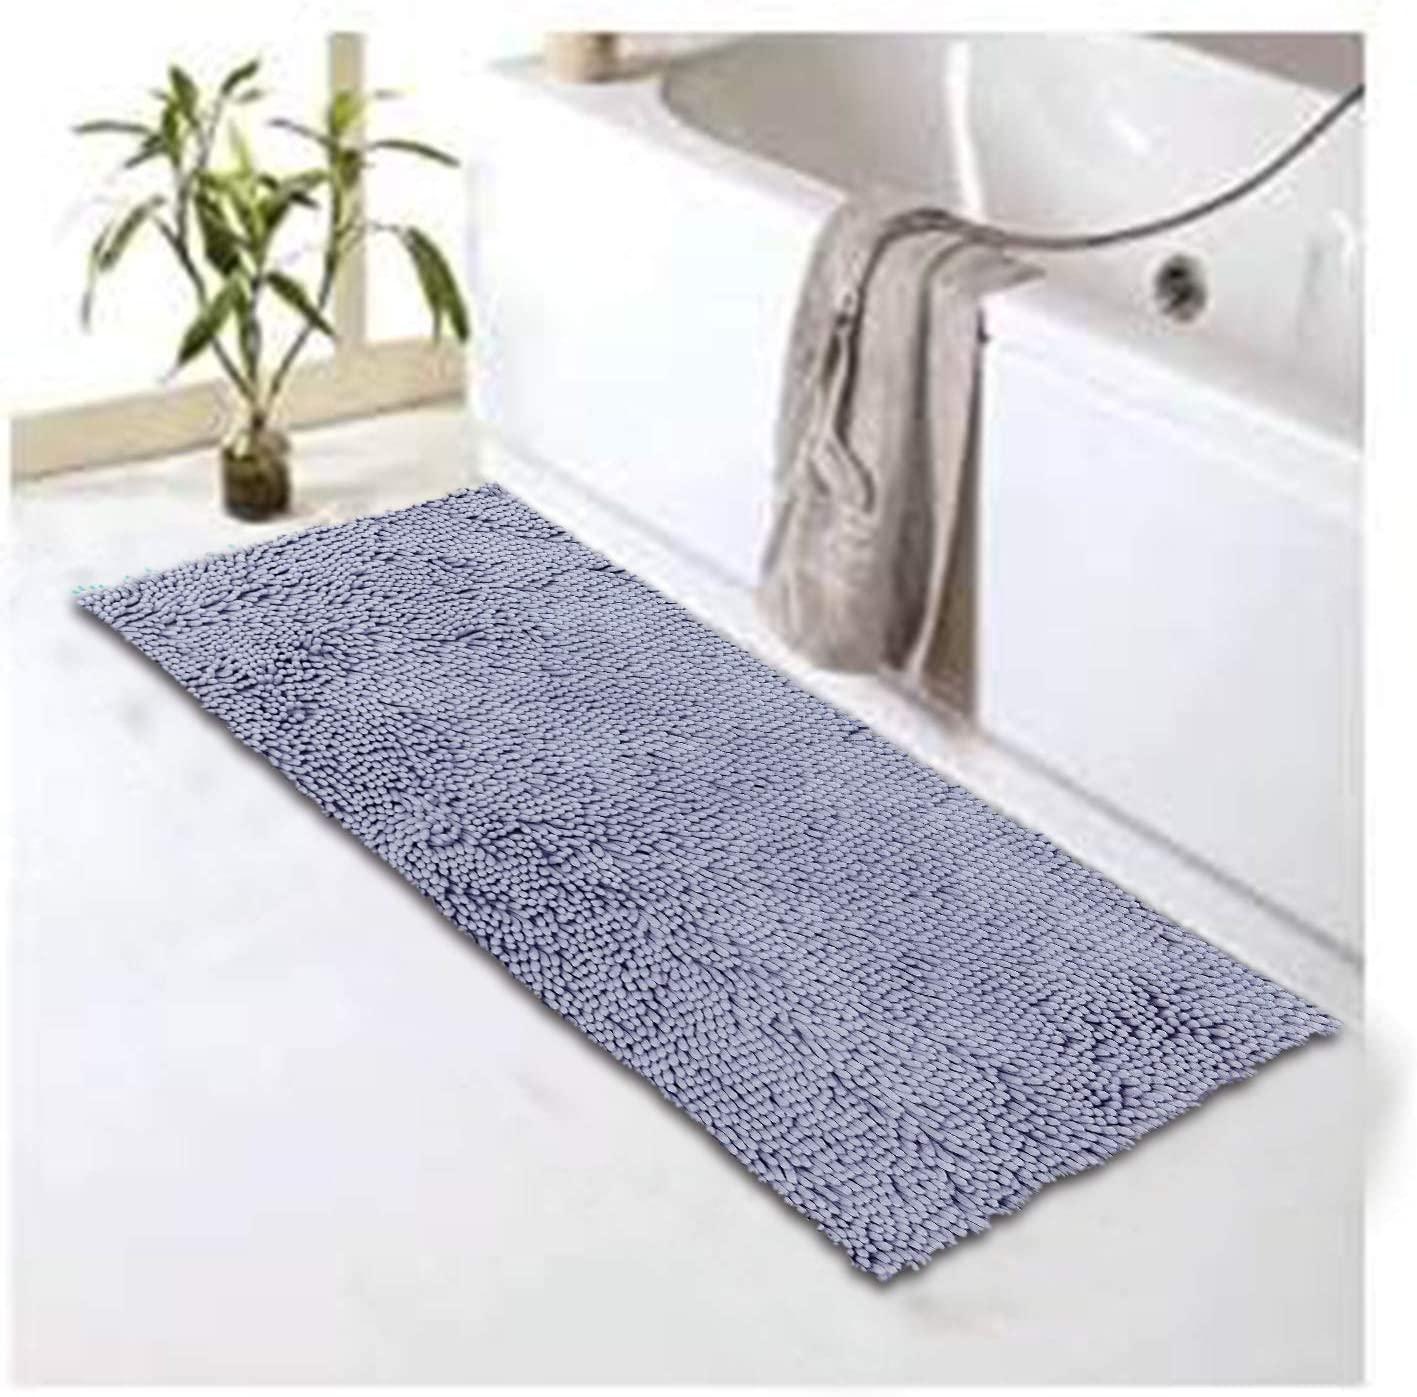 Bathroom Runner Rug Mat 27.5 x 47 Grey Chenille Bath Mat Runner Super Absorbent Bath Rug Machine Washable Perfect Plush Carpet for Shower, Bath Room, Bedroom and Kitchen (27.5 x 47, Grey)